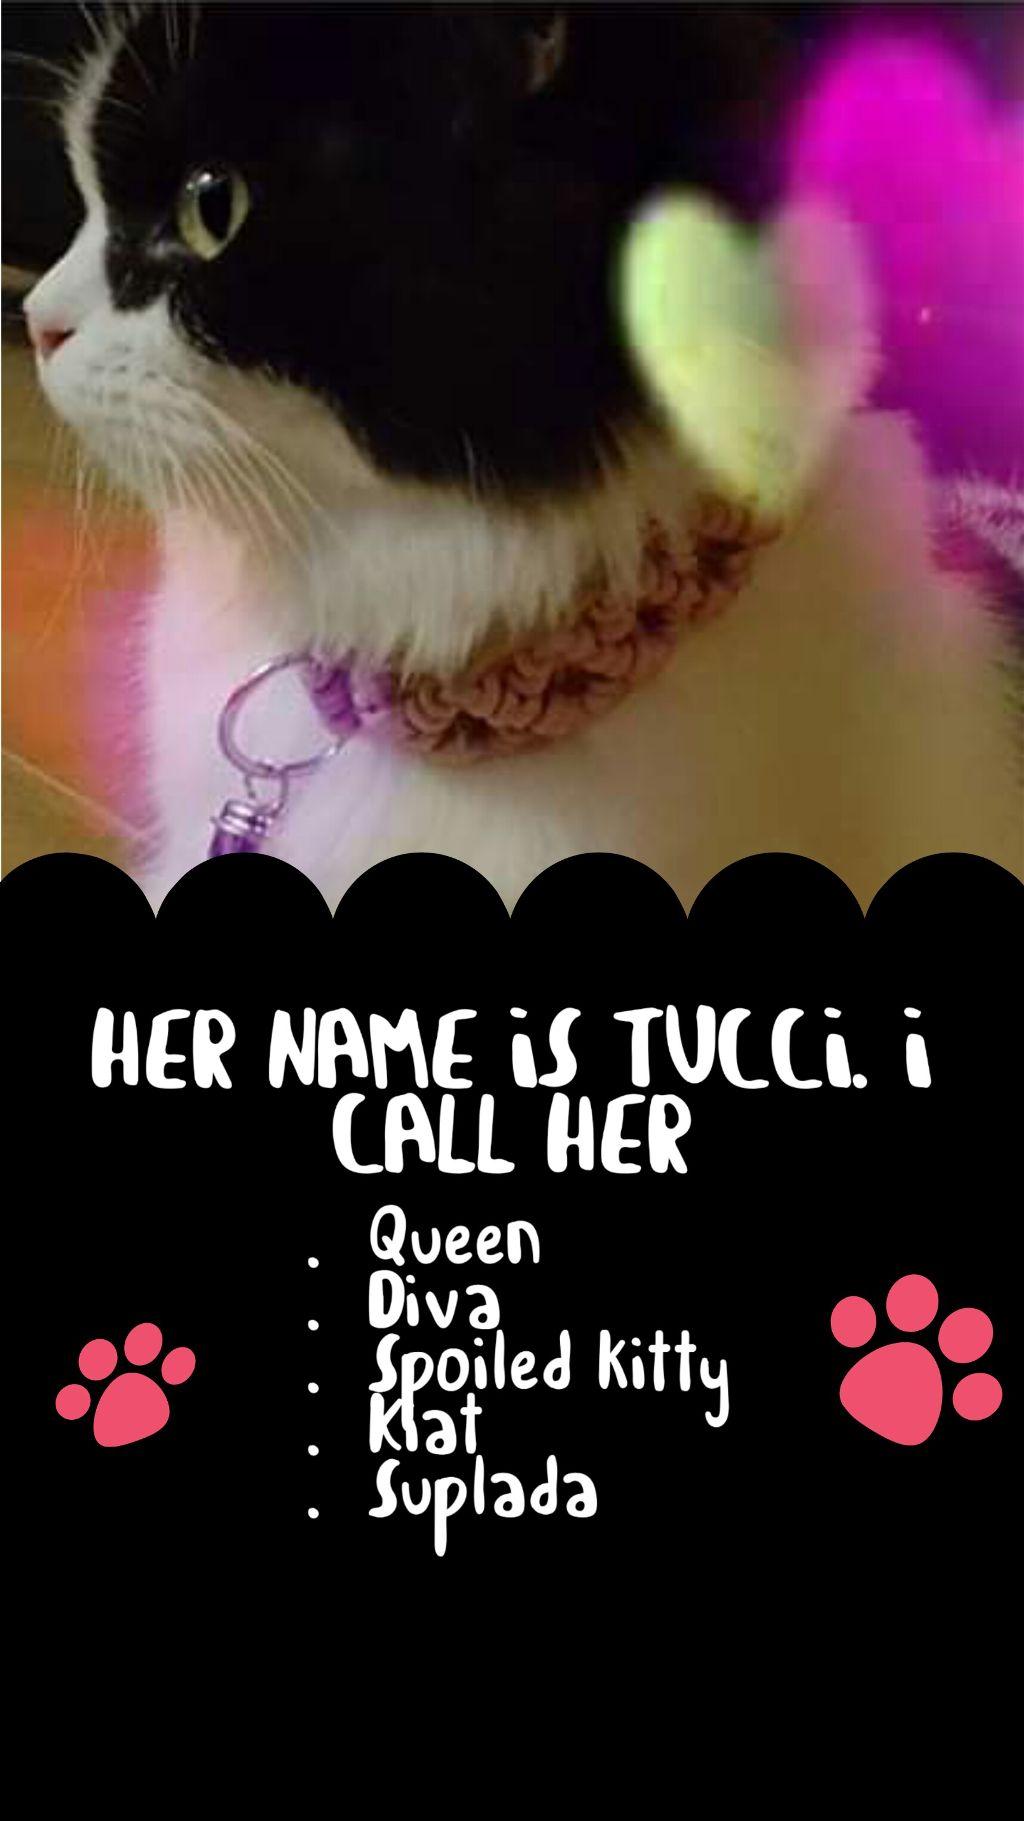 #freetoedit  #mypet #cutepets  #cat #template